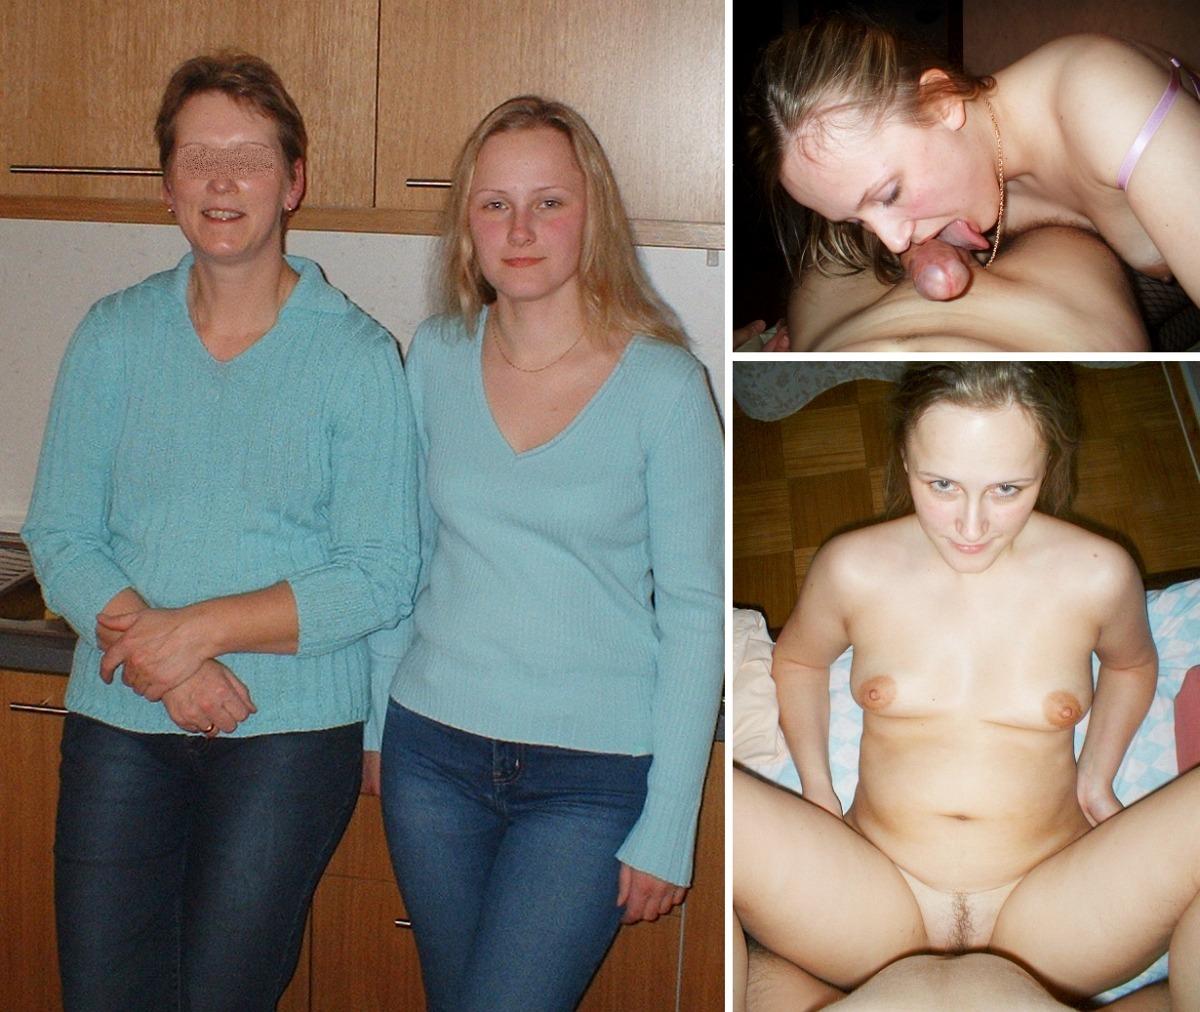 Undressed daughter dressed Yahoo ahora